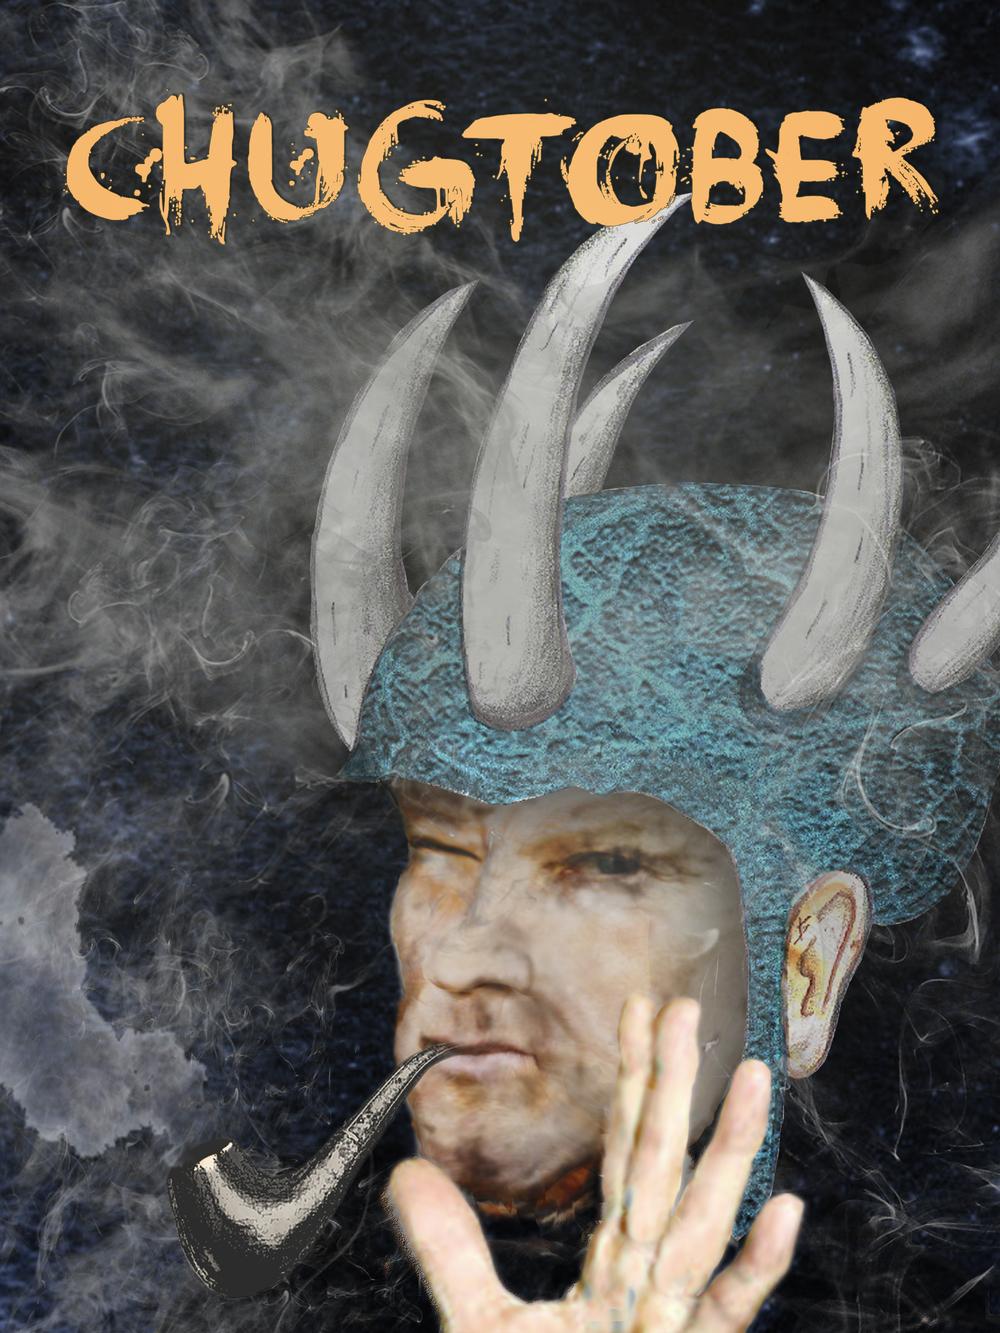 ChugtoberGraphic.jpg